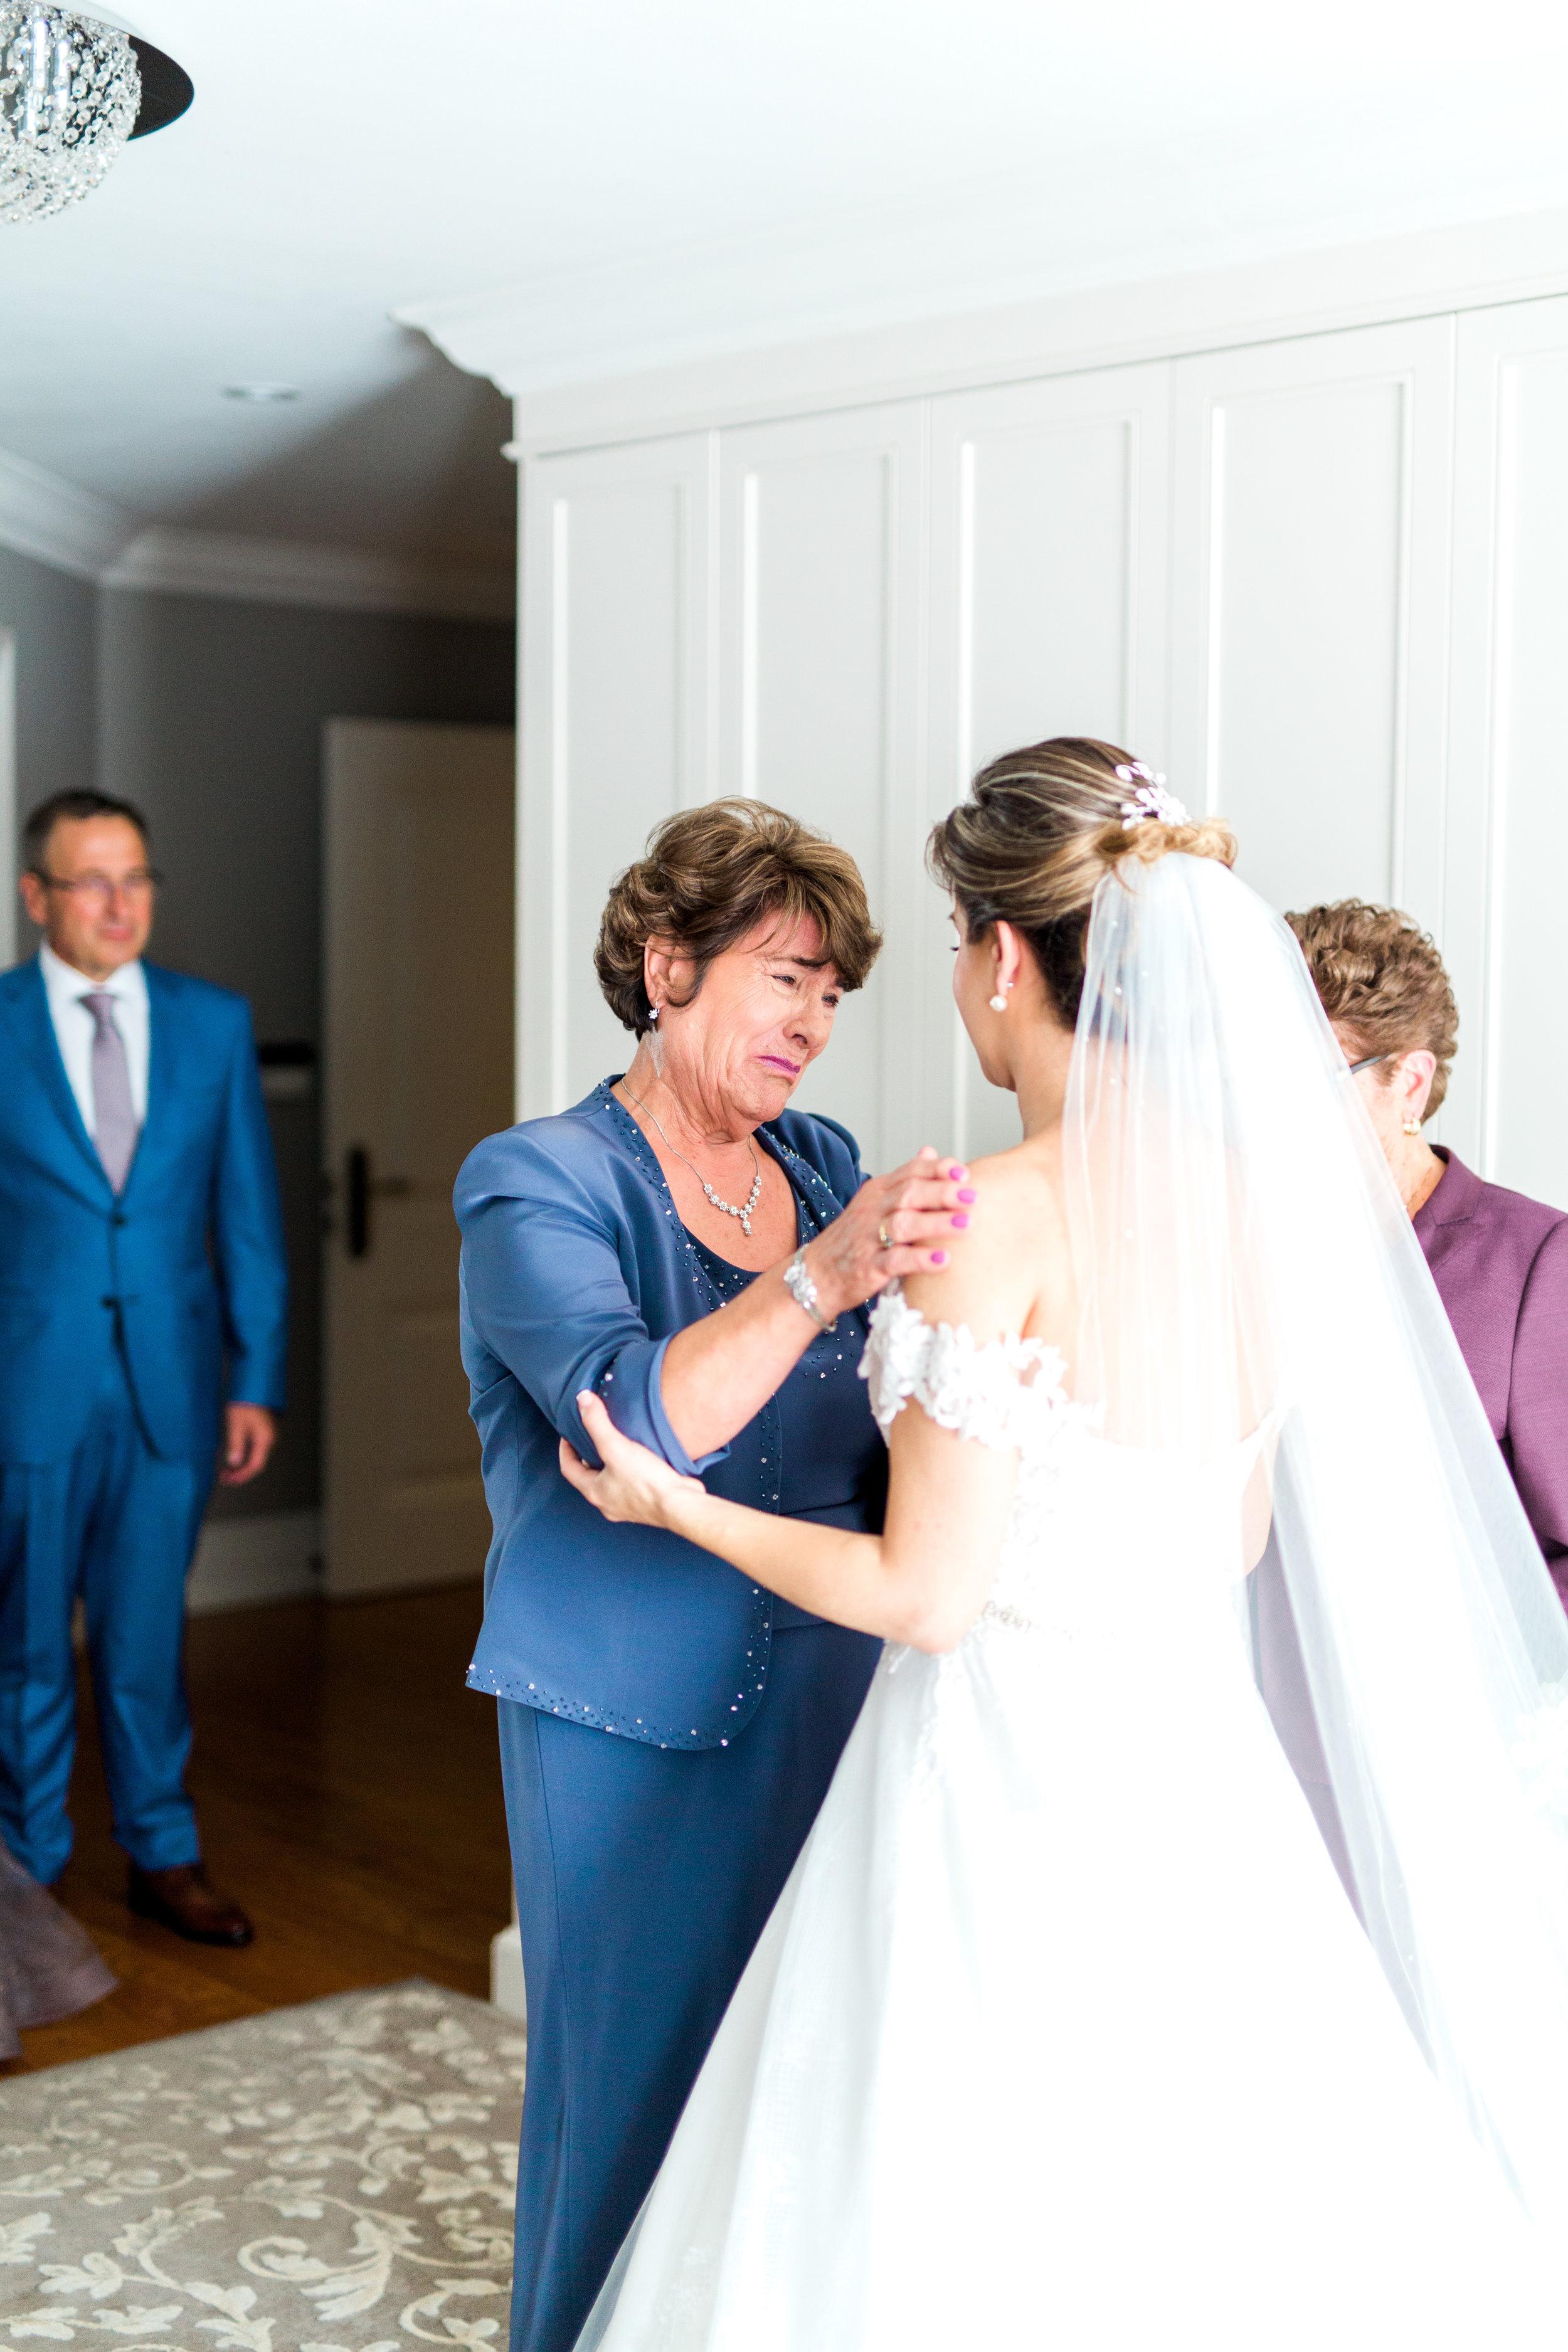 Danielle-Giroux-Amir-Golbazi-Toronto-Wedding-Photographer-Bellvue-Manor_DeLuca_1-200.jpg